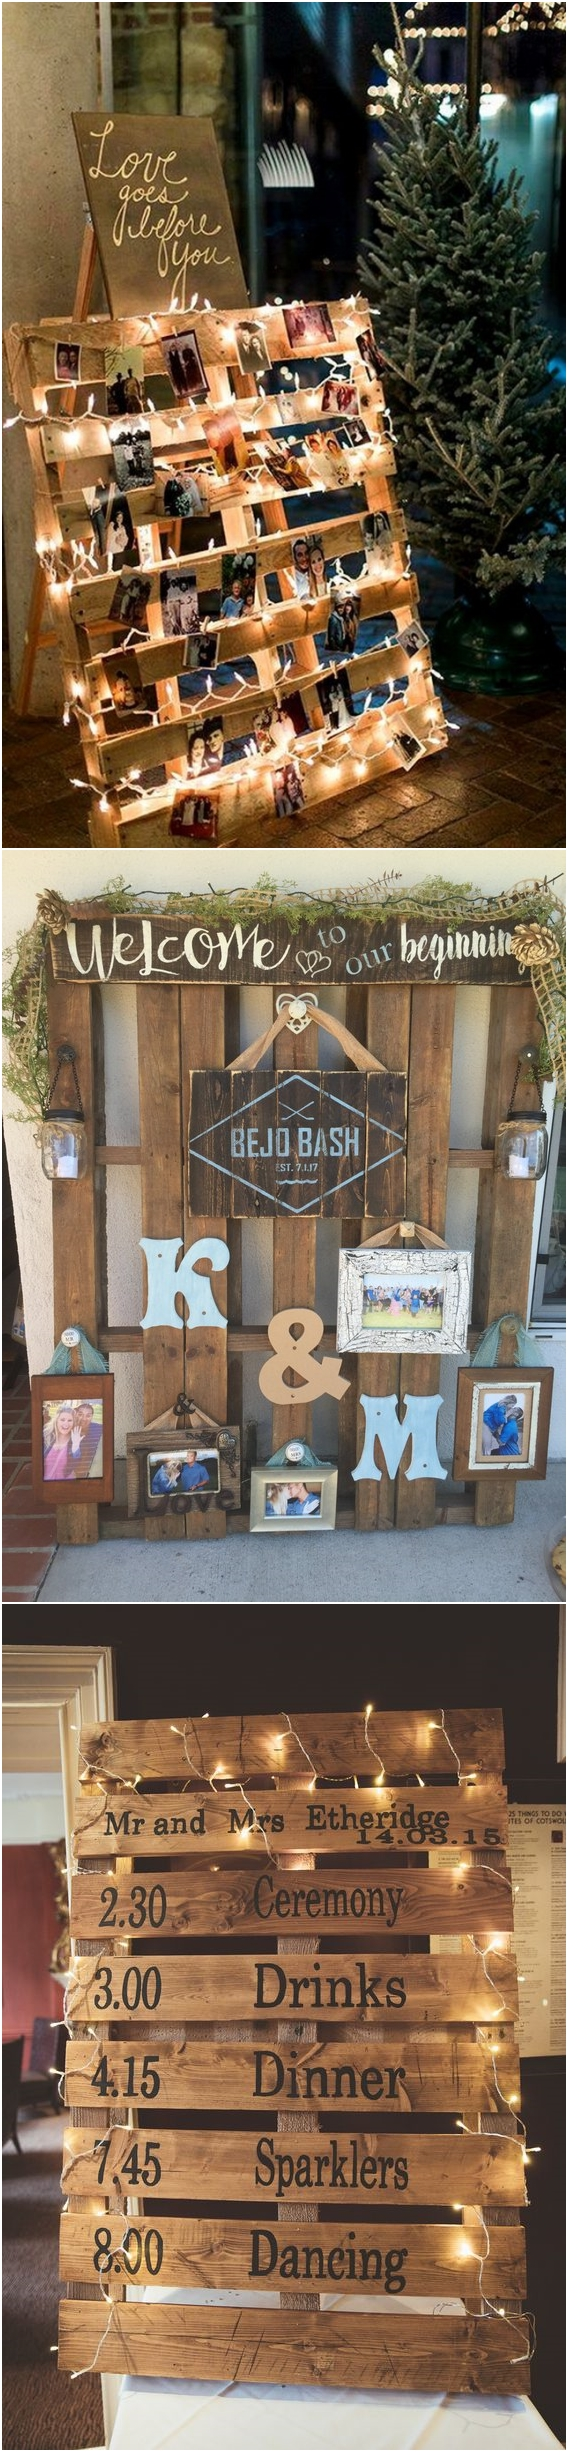 Rustic Wood Pallet Wedding Photo Display Rusticwedding Countrywedding Country Wooden Weddingideas Weddingdecor